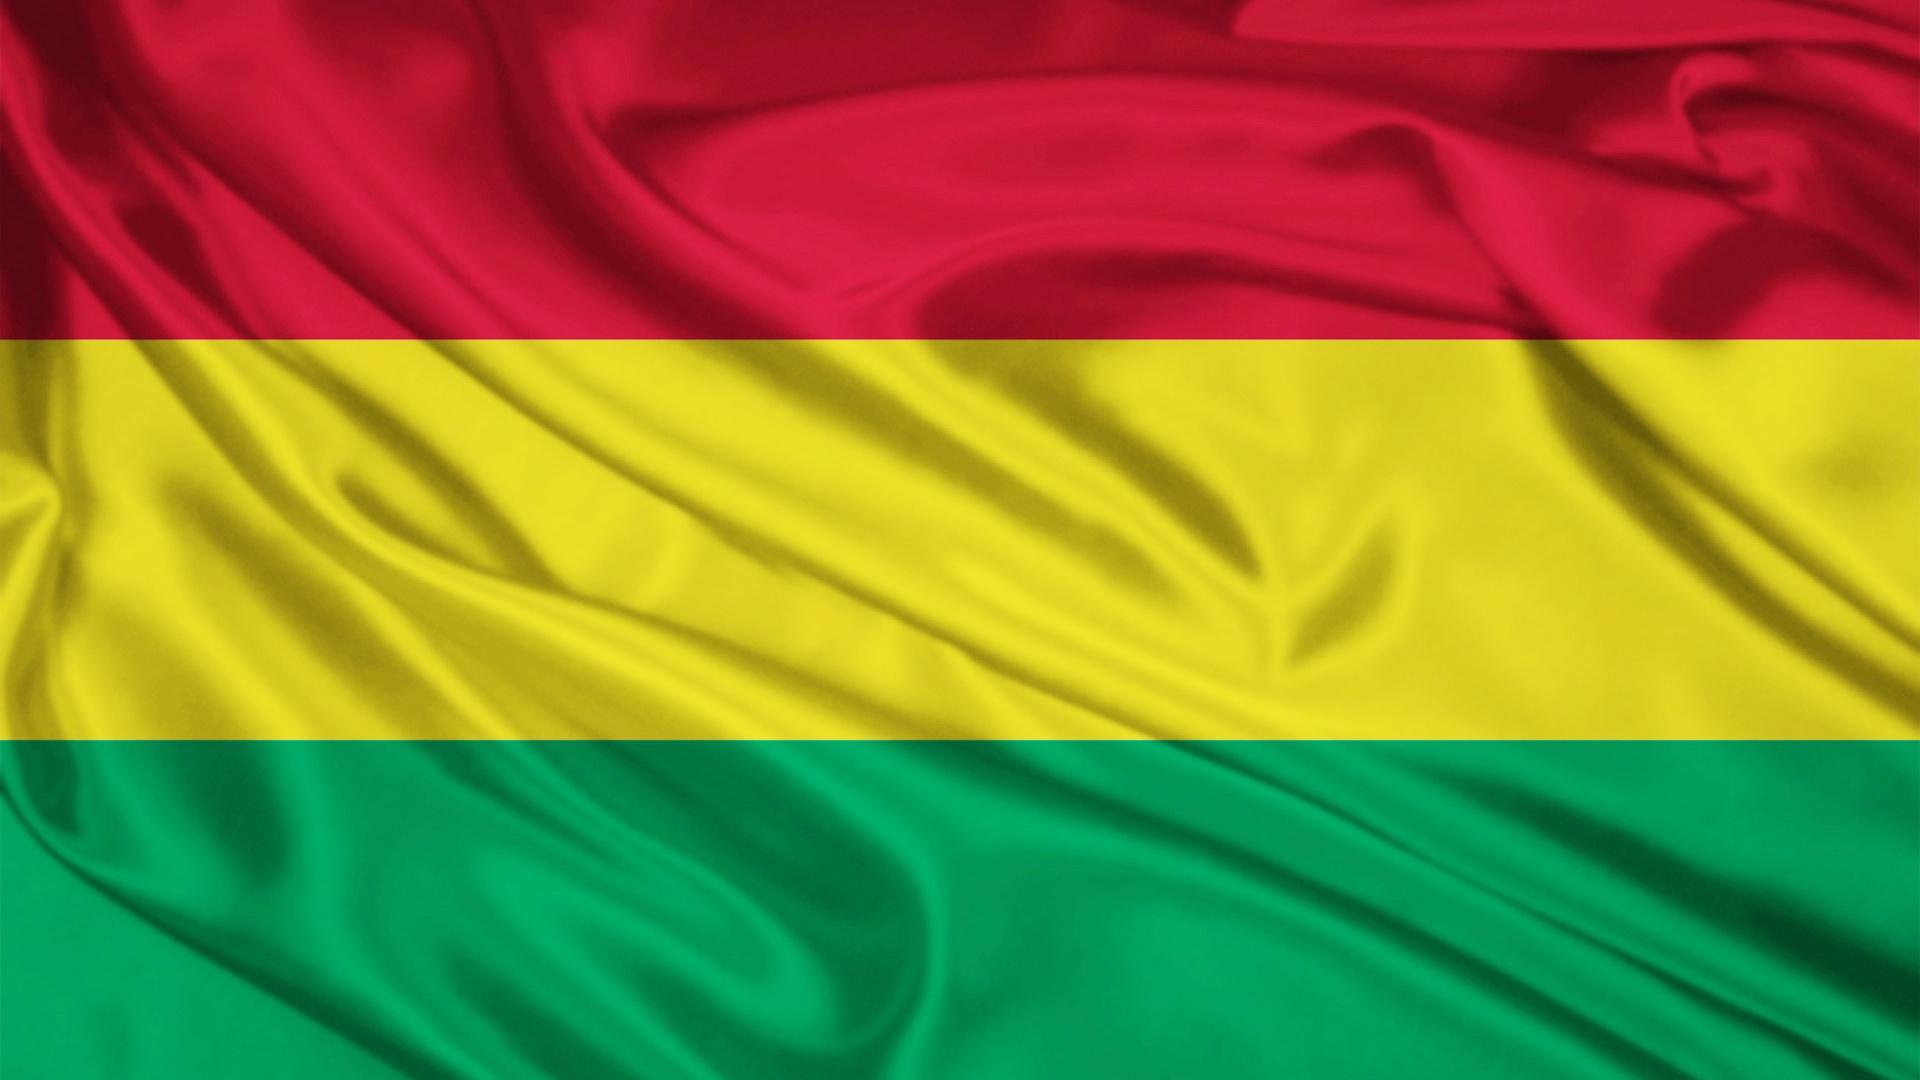 Bolivia Flag Day hd desktop wallpapers Picturenixcom 1920x1080